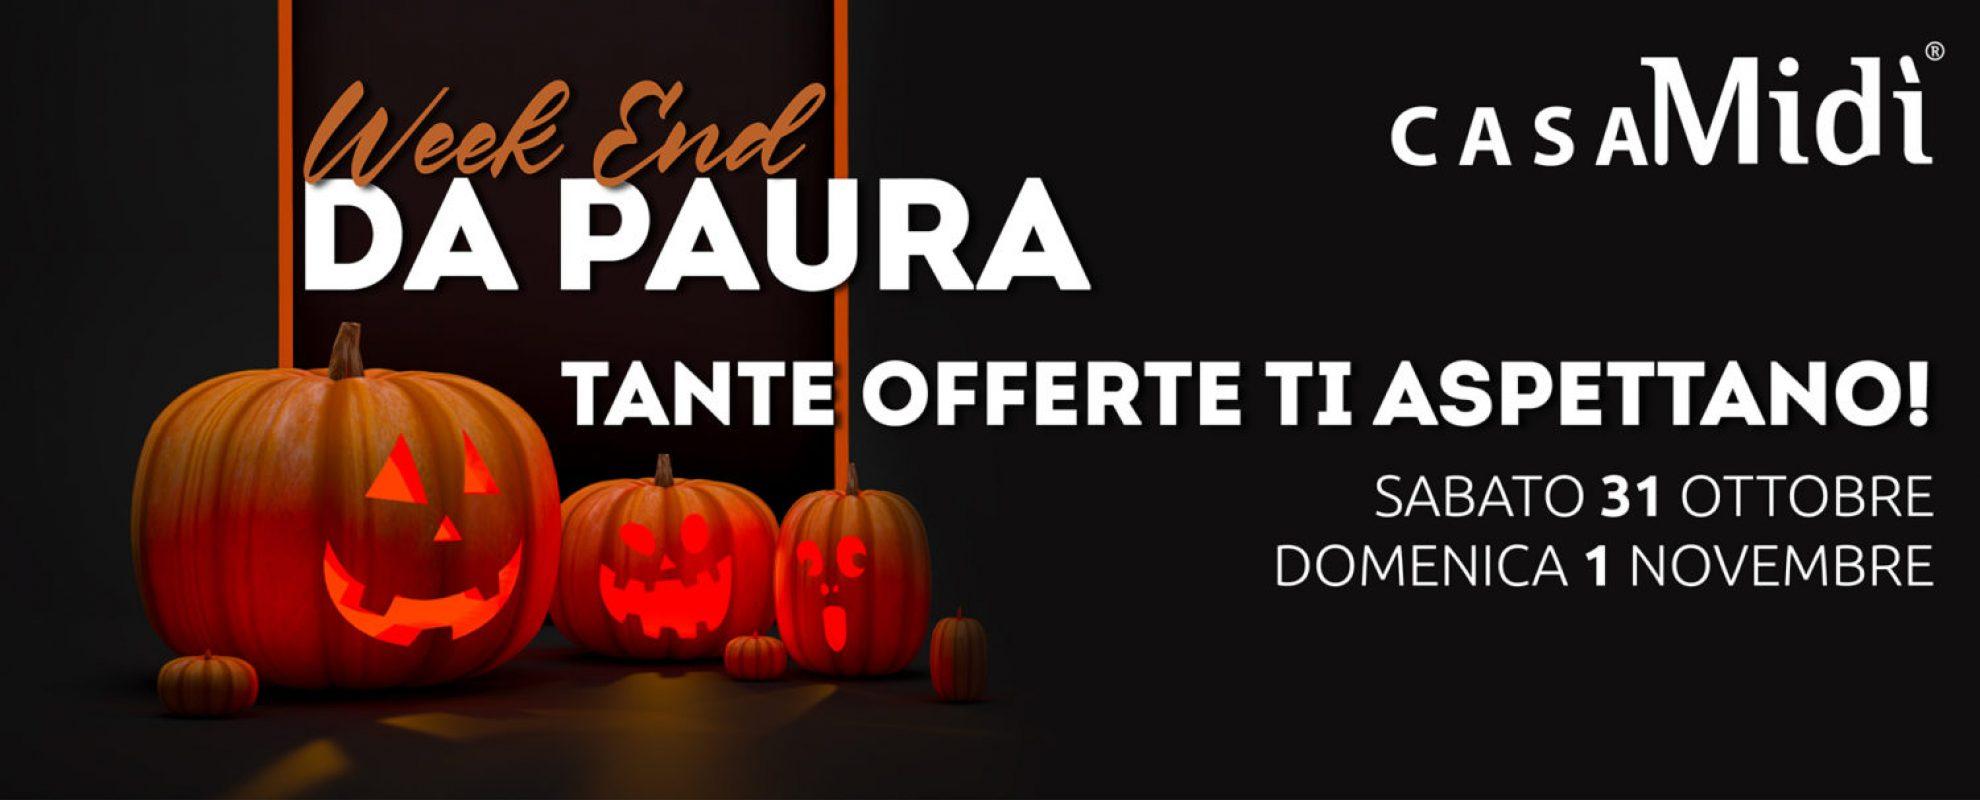 homepage halloween_Tavola disegno 1